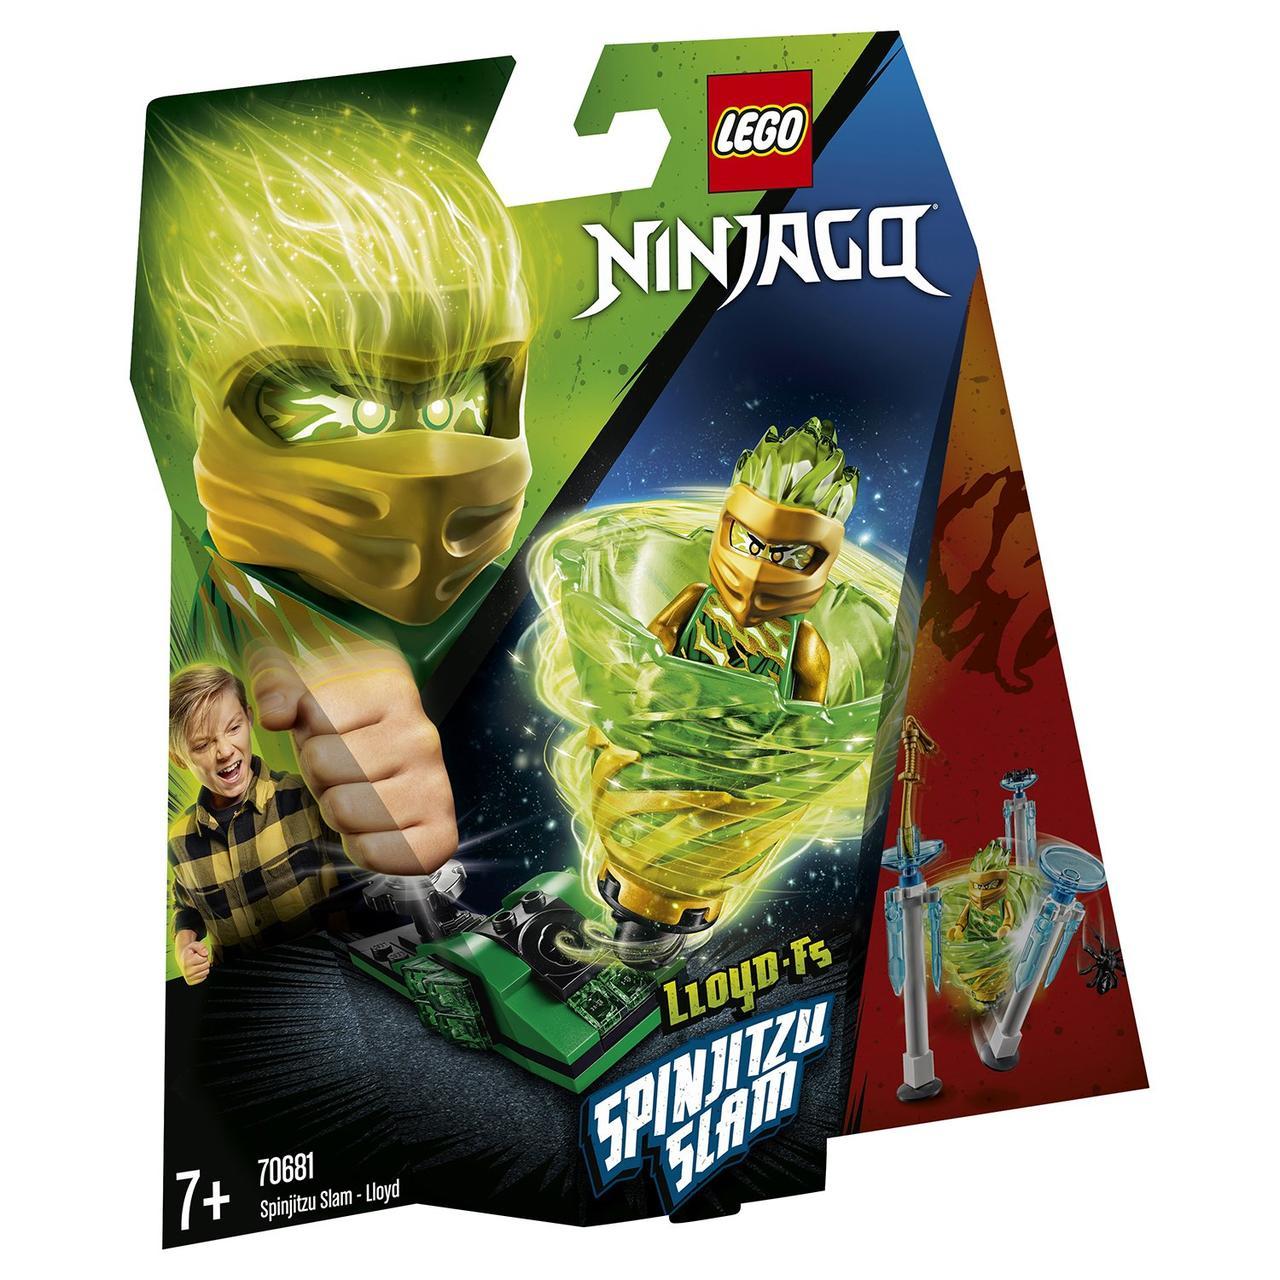 70681 Lego Ninjago Бой мастеров кружитцу — Ллойд, Лего Ниндзяго